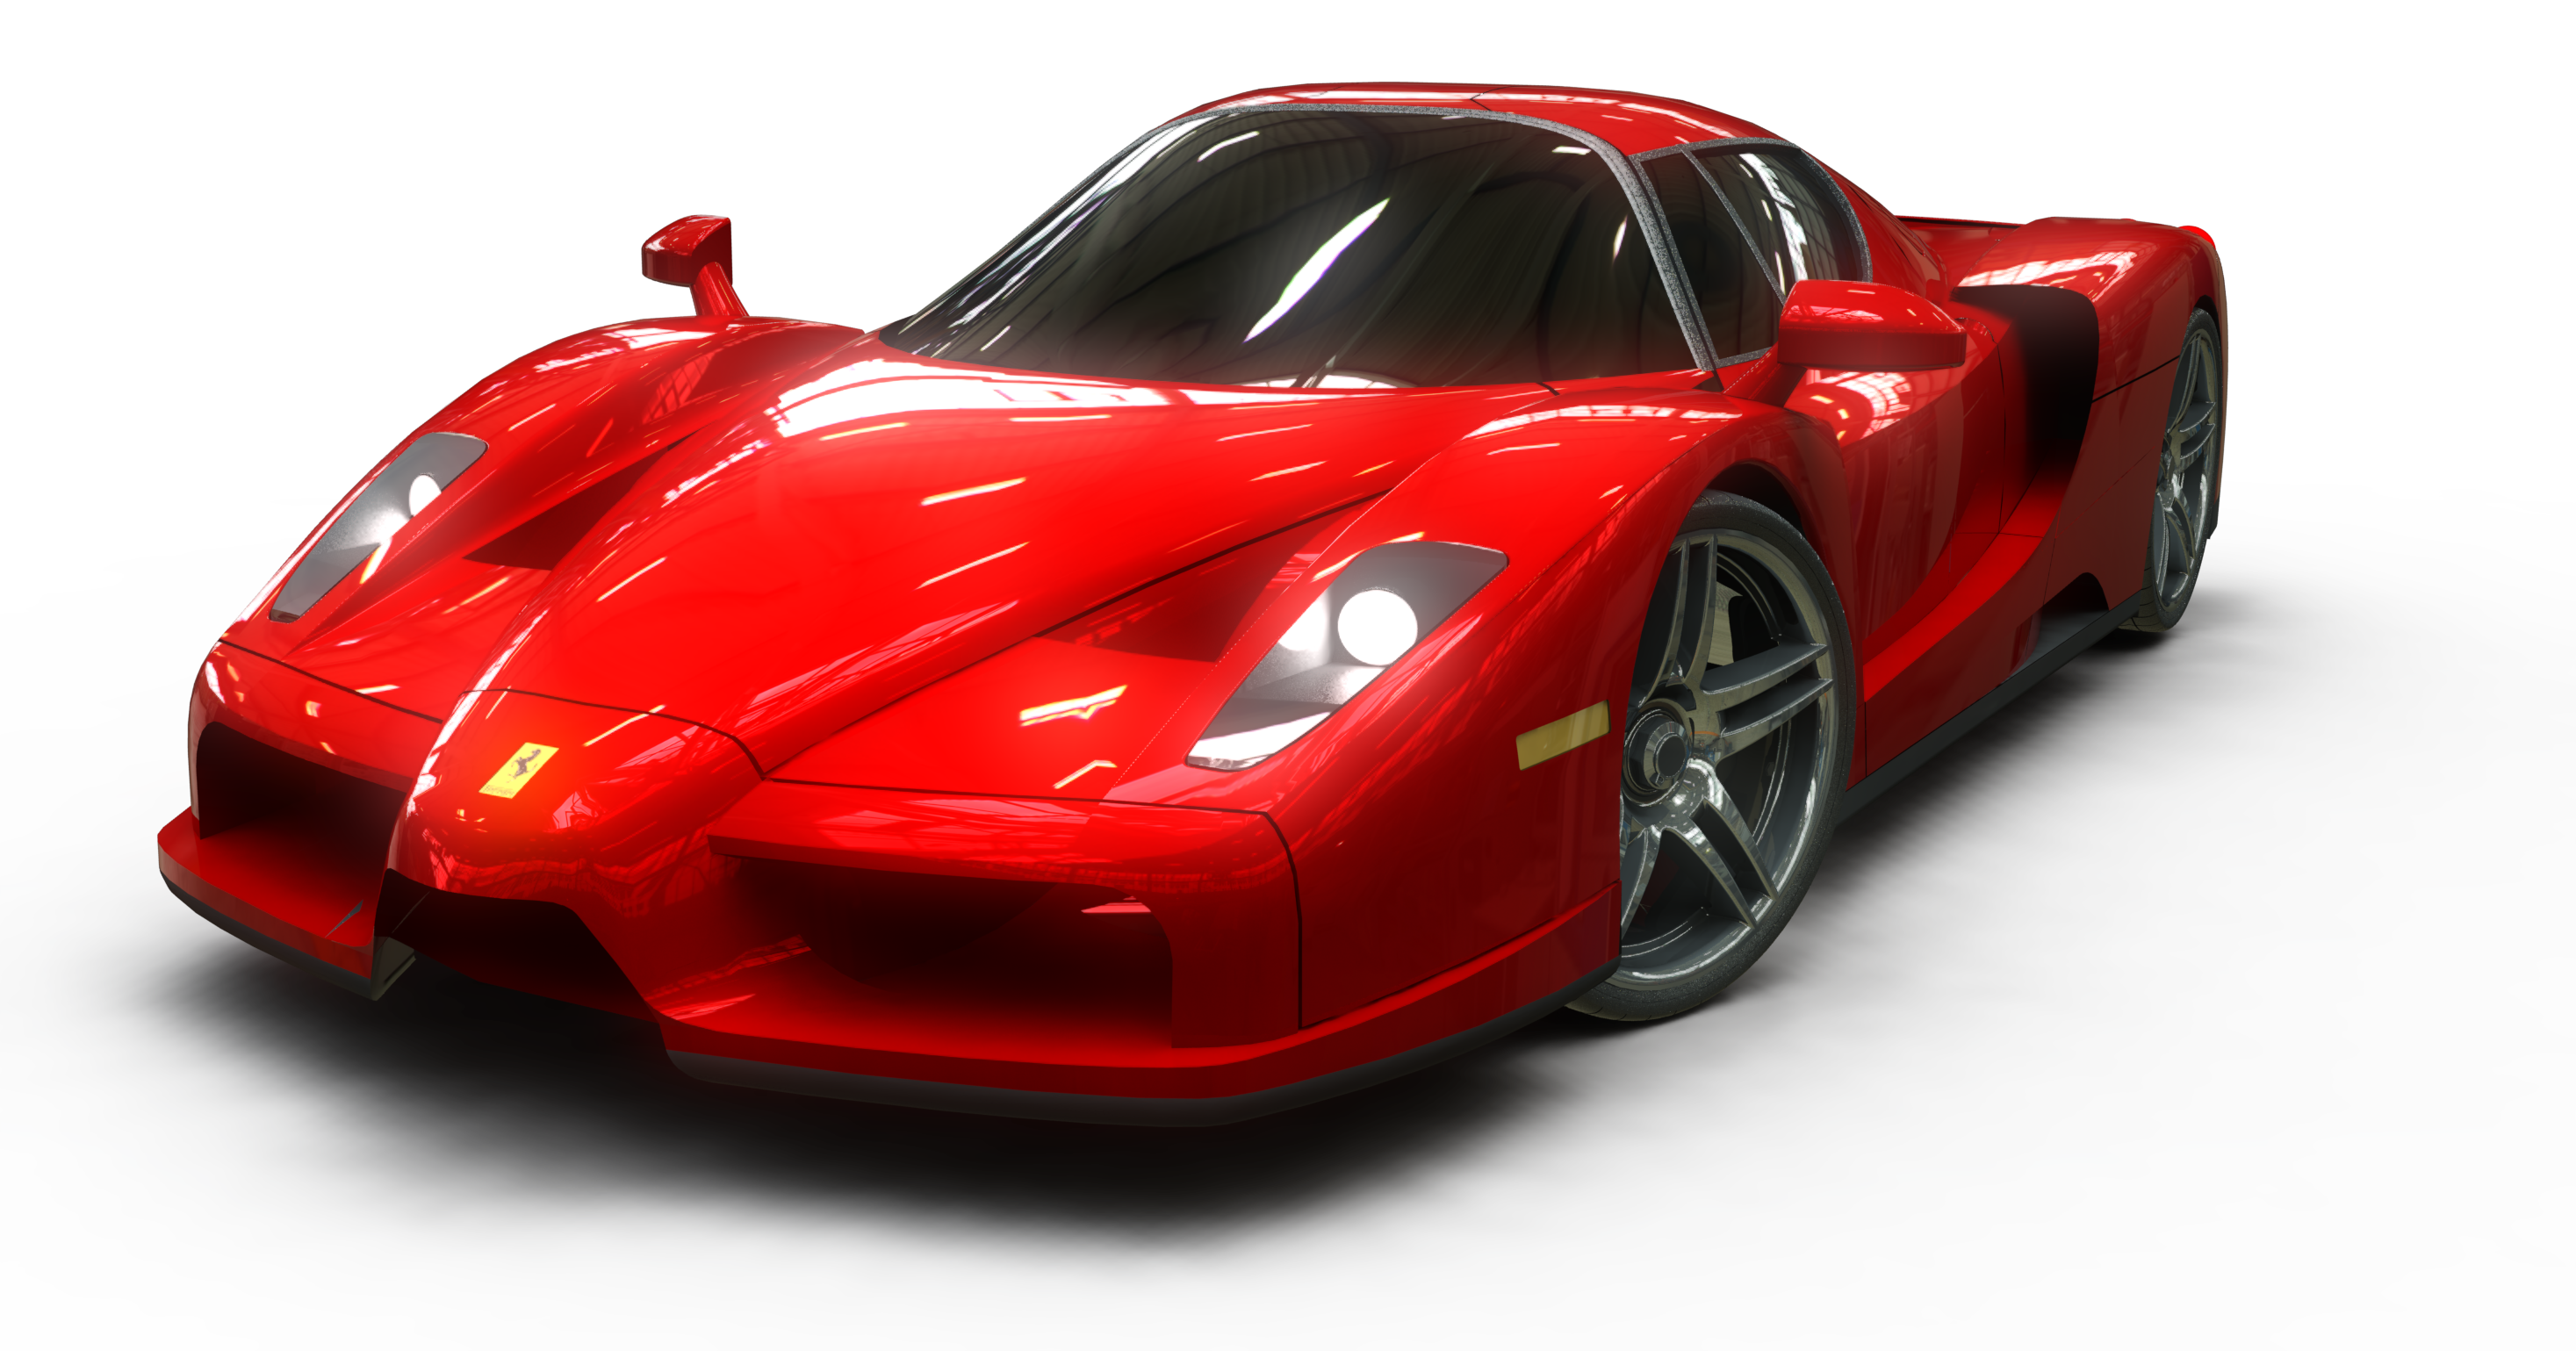 Download Ferrari Png Hd Hq Png Image Freepngimg